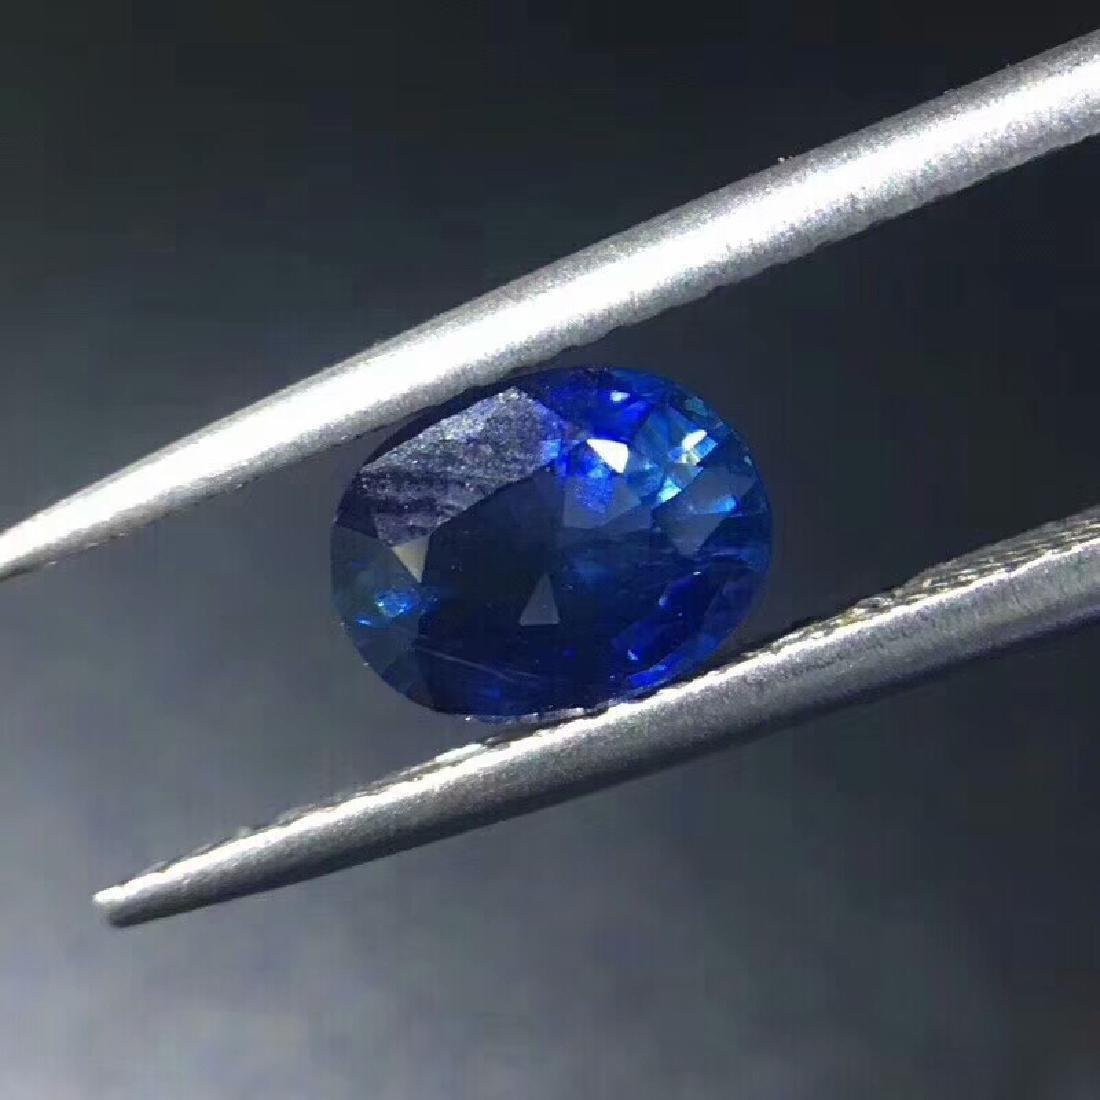 1.3 ct Sapphire 7.2*5.9*3.7 mm Oval Cut - 3